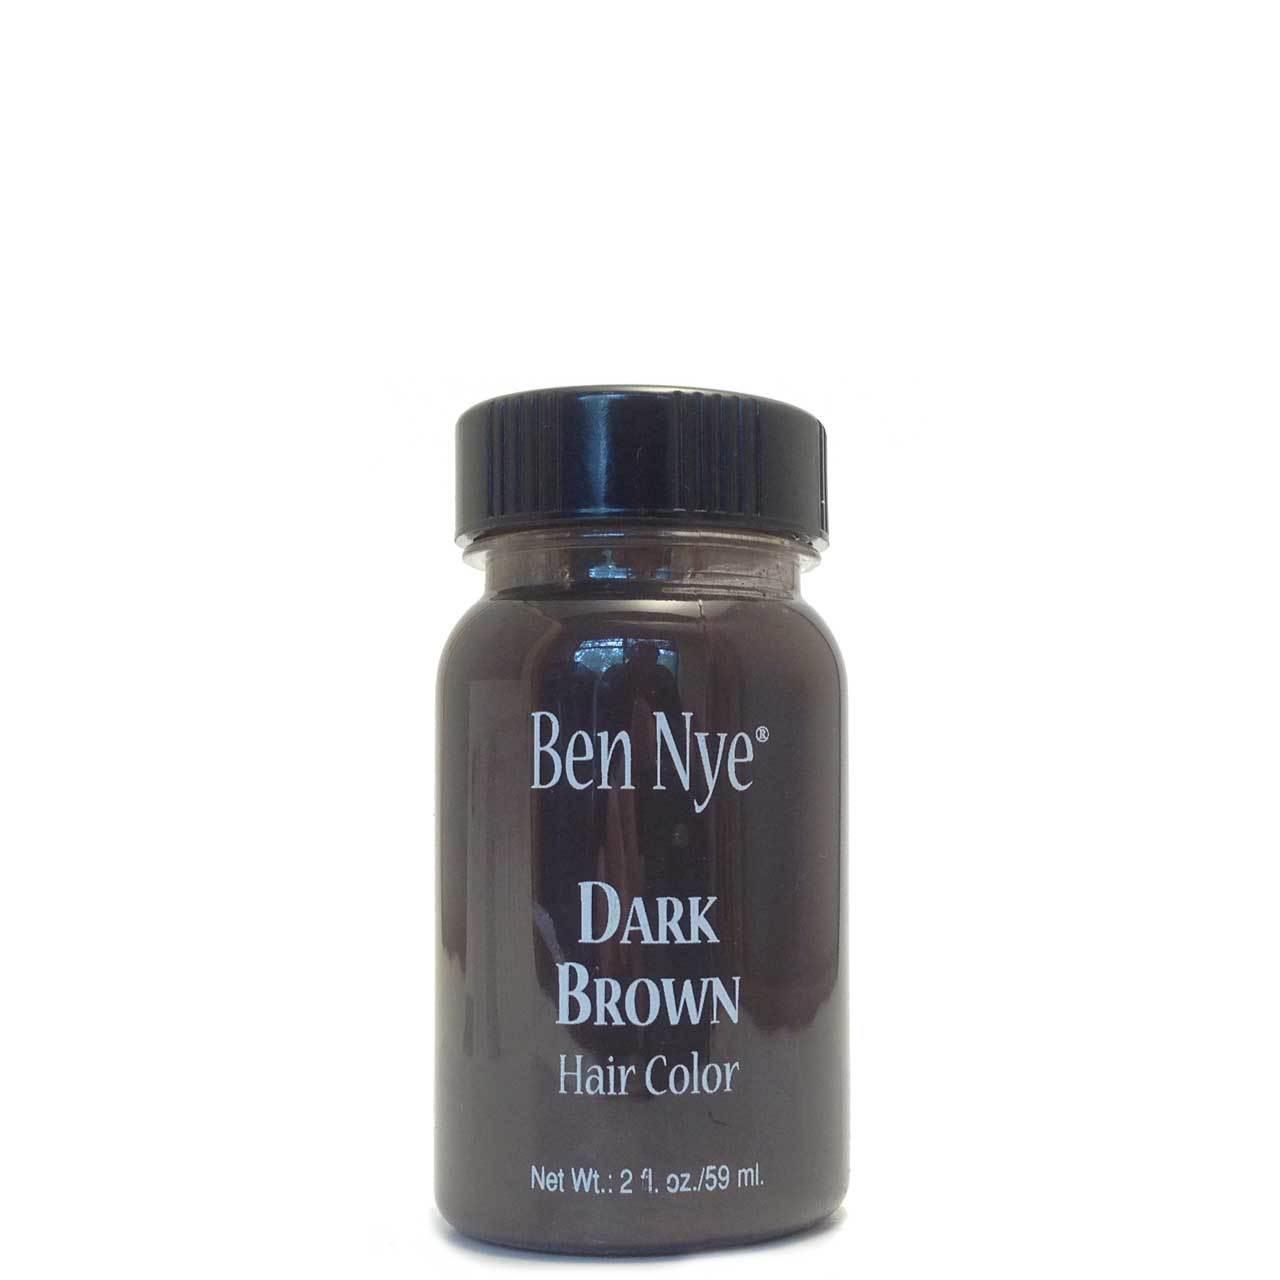 Hair Color( maquiagem para cabelo) castanho escuro Ben Nye- 59ml